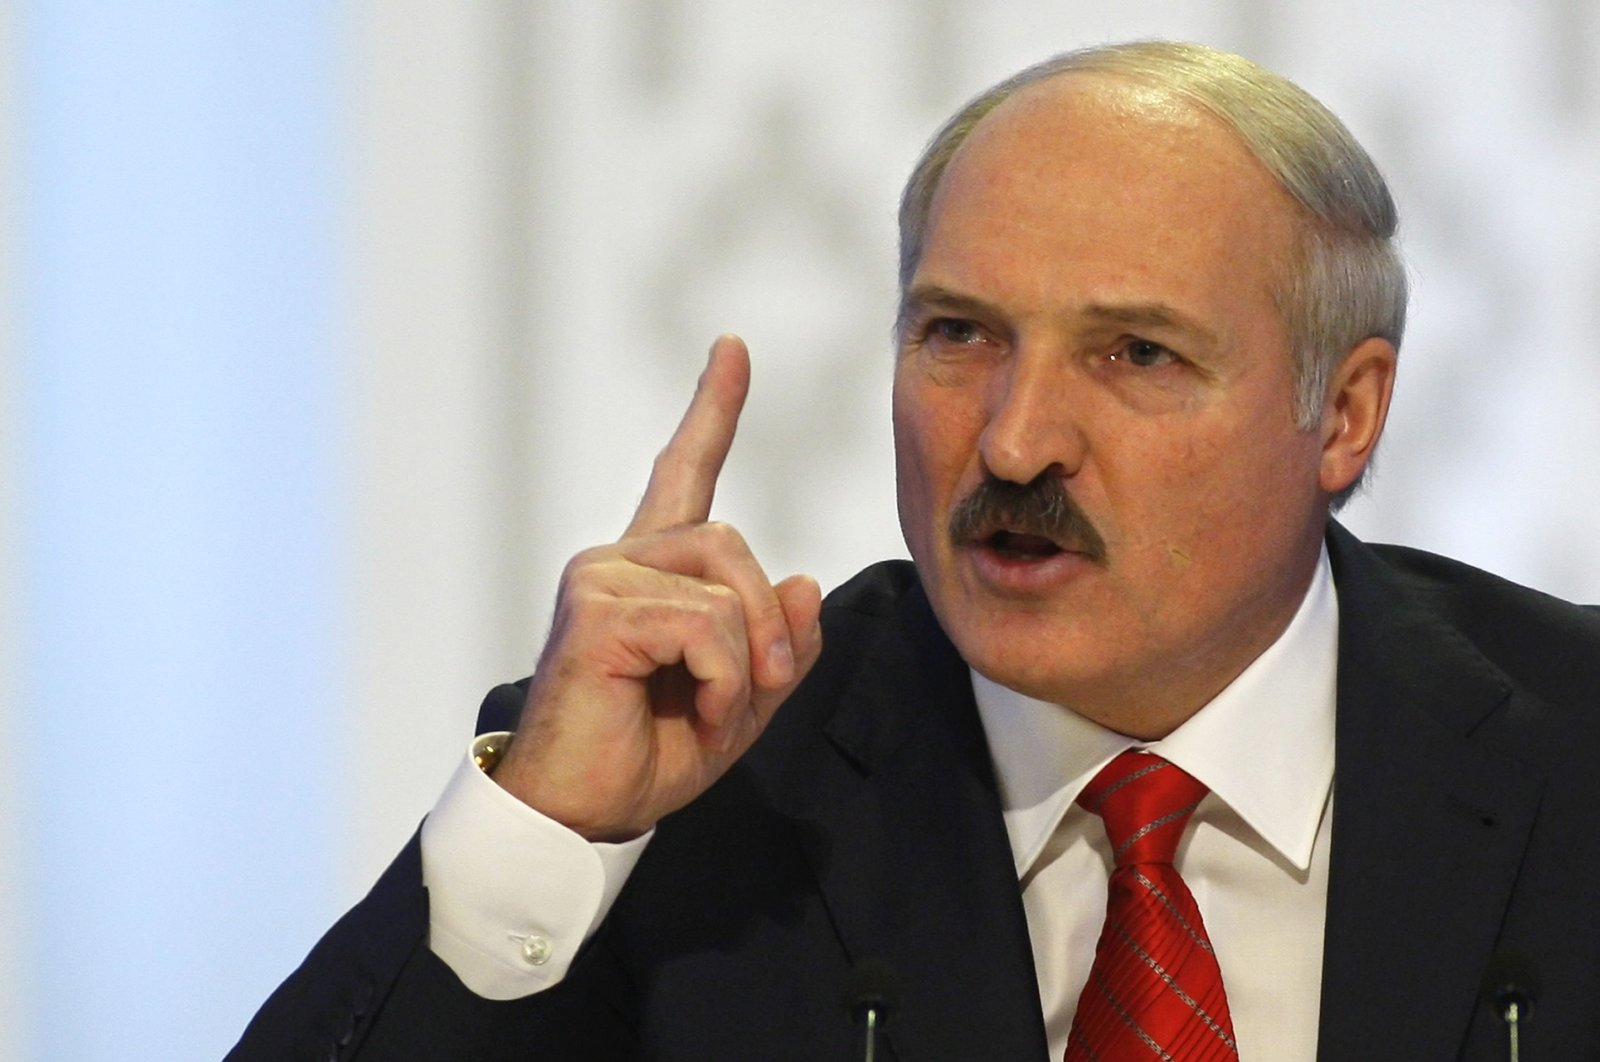 Belarusian President Alexander Lukashenko gestures prior to a news conference in the capital, Minsk, Belarus, Dec. 20, 2010. (AP Photo)